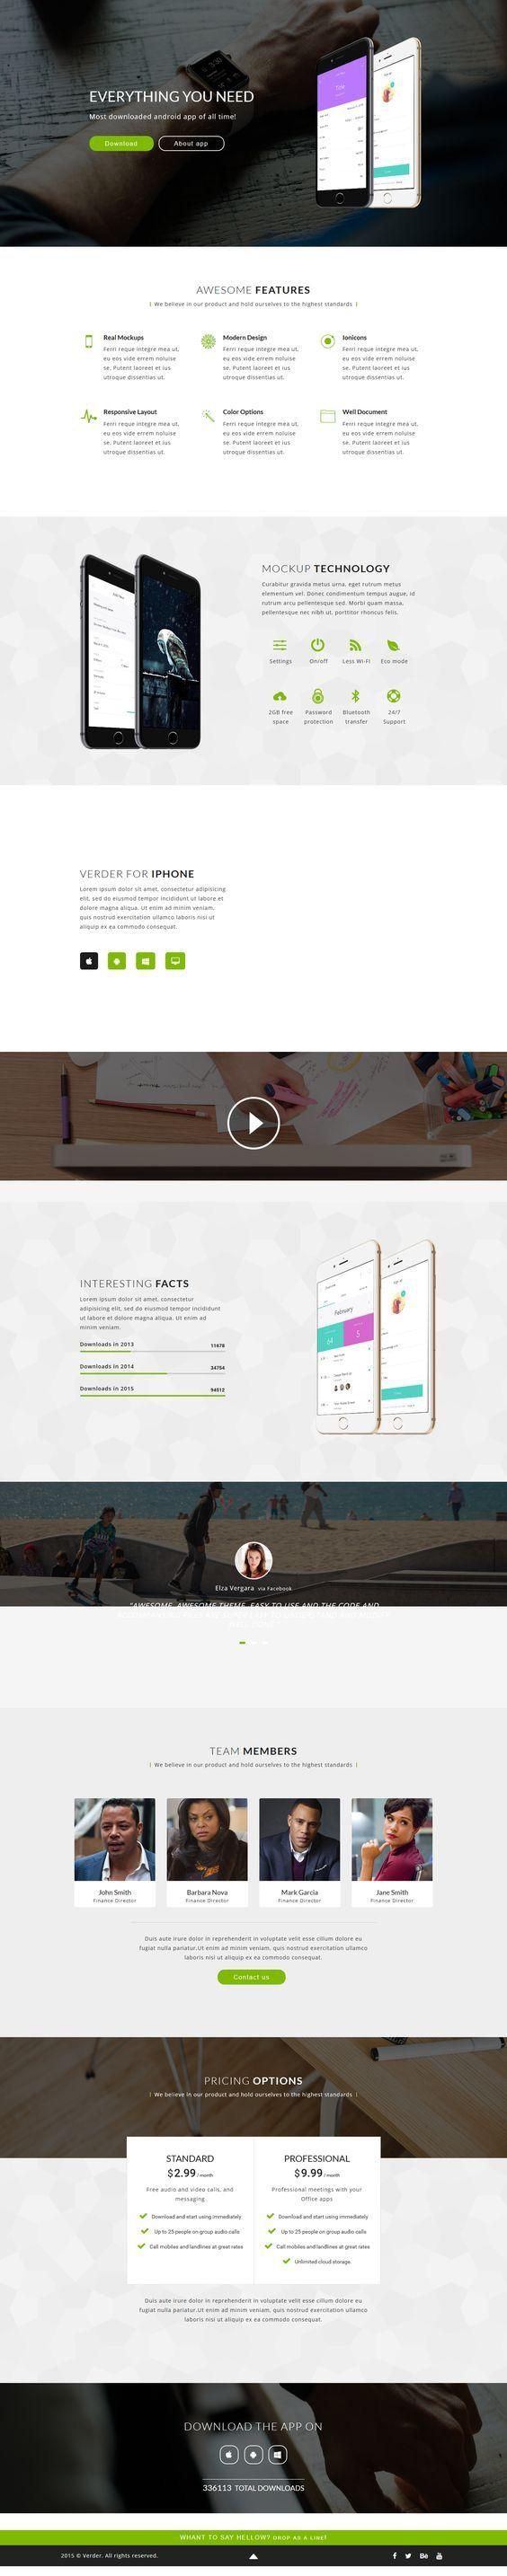 Verder - Responsive App Landing Page. Download: https://themeforest.net/item/verder-responsive-app-landing-page/16804226?ref=skarin